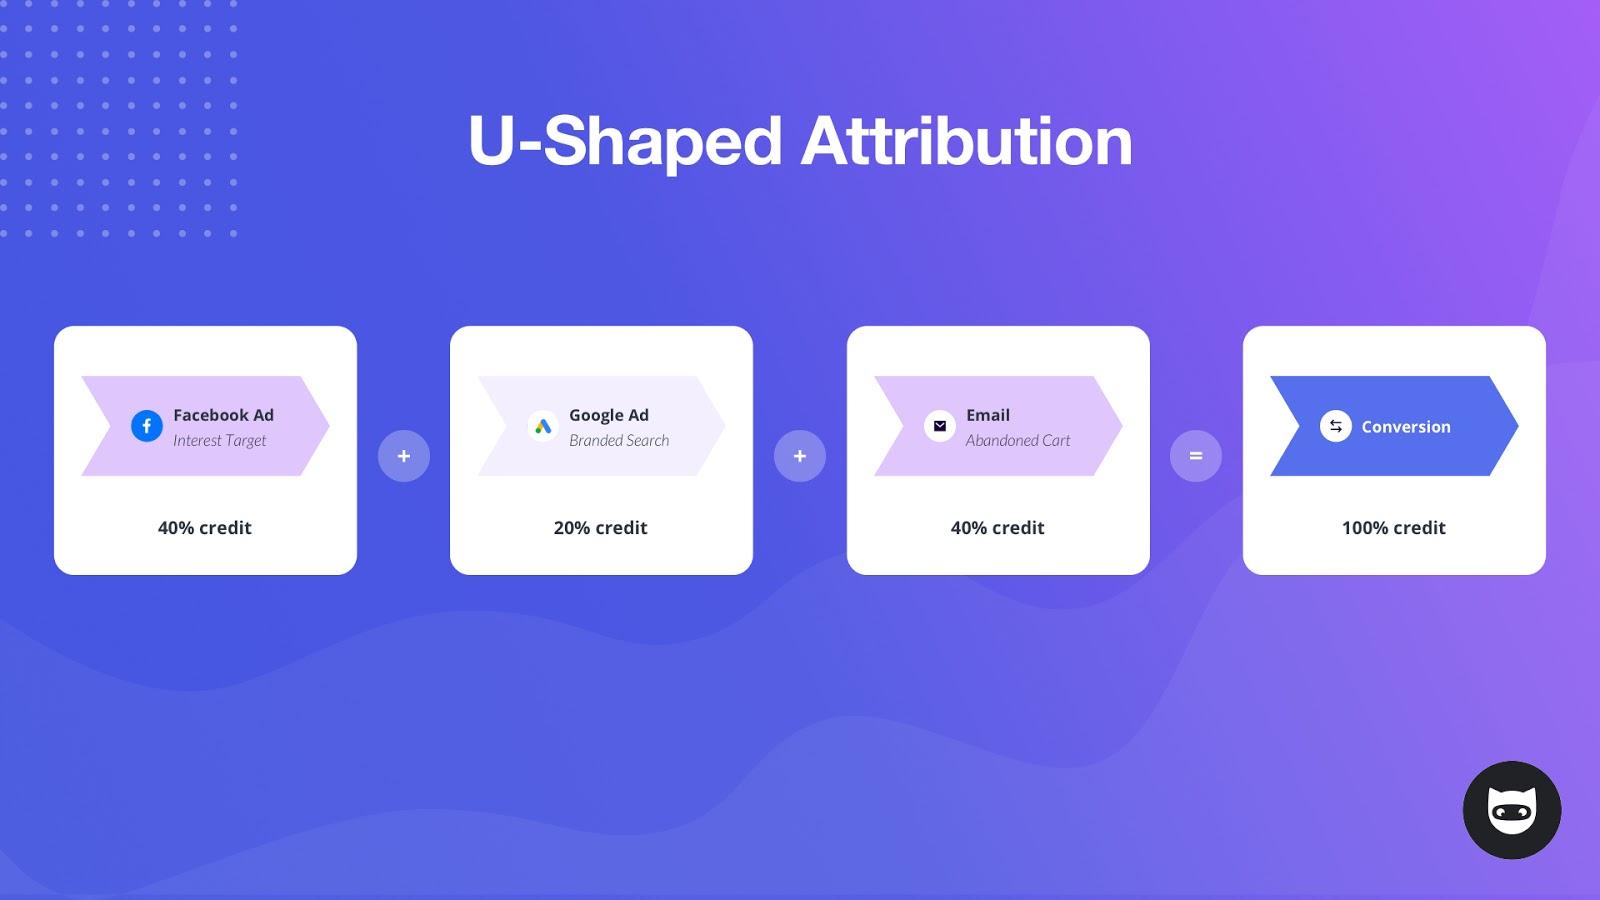 U-Shaped Attribution Model for Digital Marketing, from NinjaCat